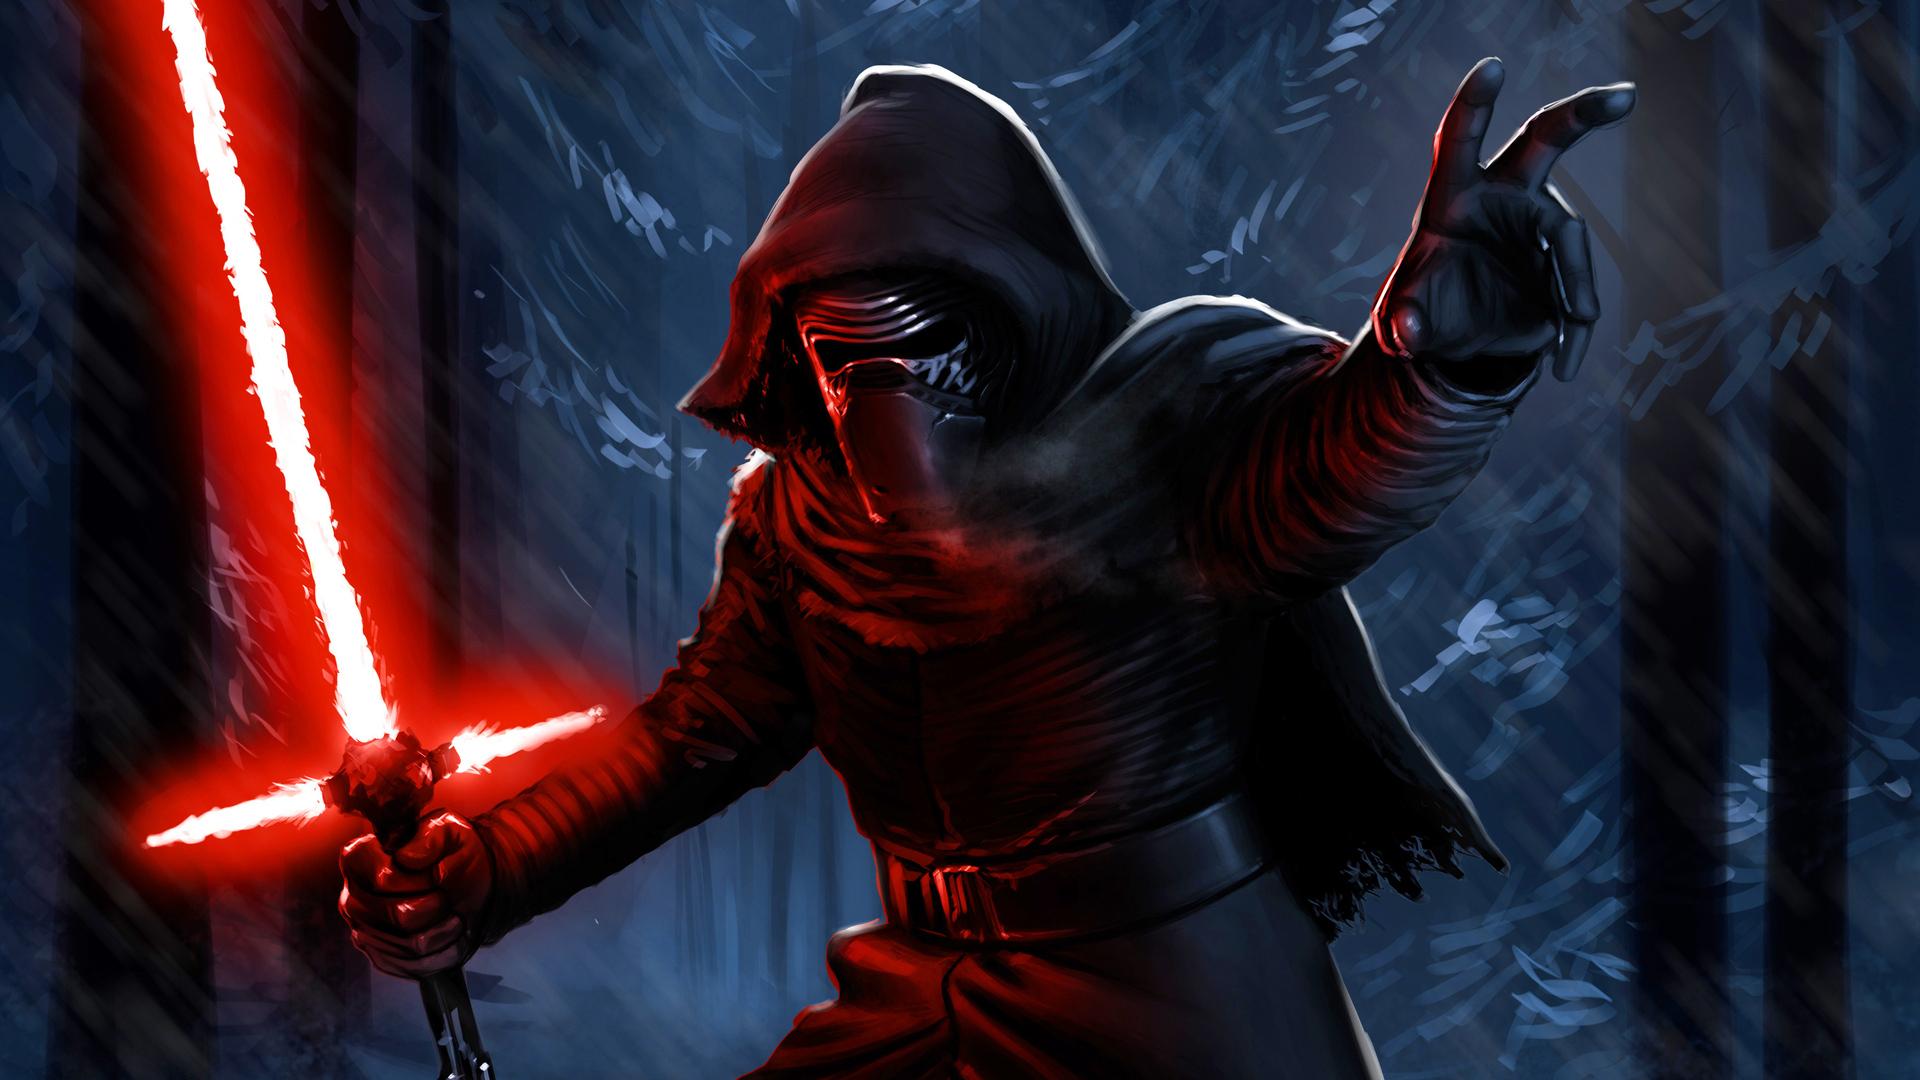 1920x1080 Darth Vader 4k Artwork 2020 Laptop Full HD 1080P ...